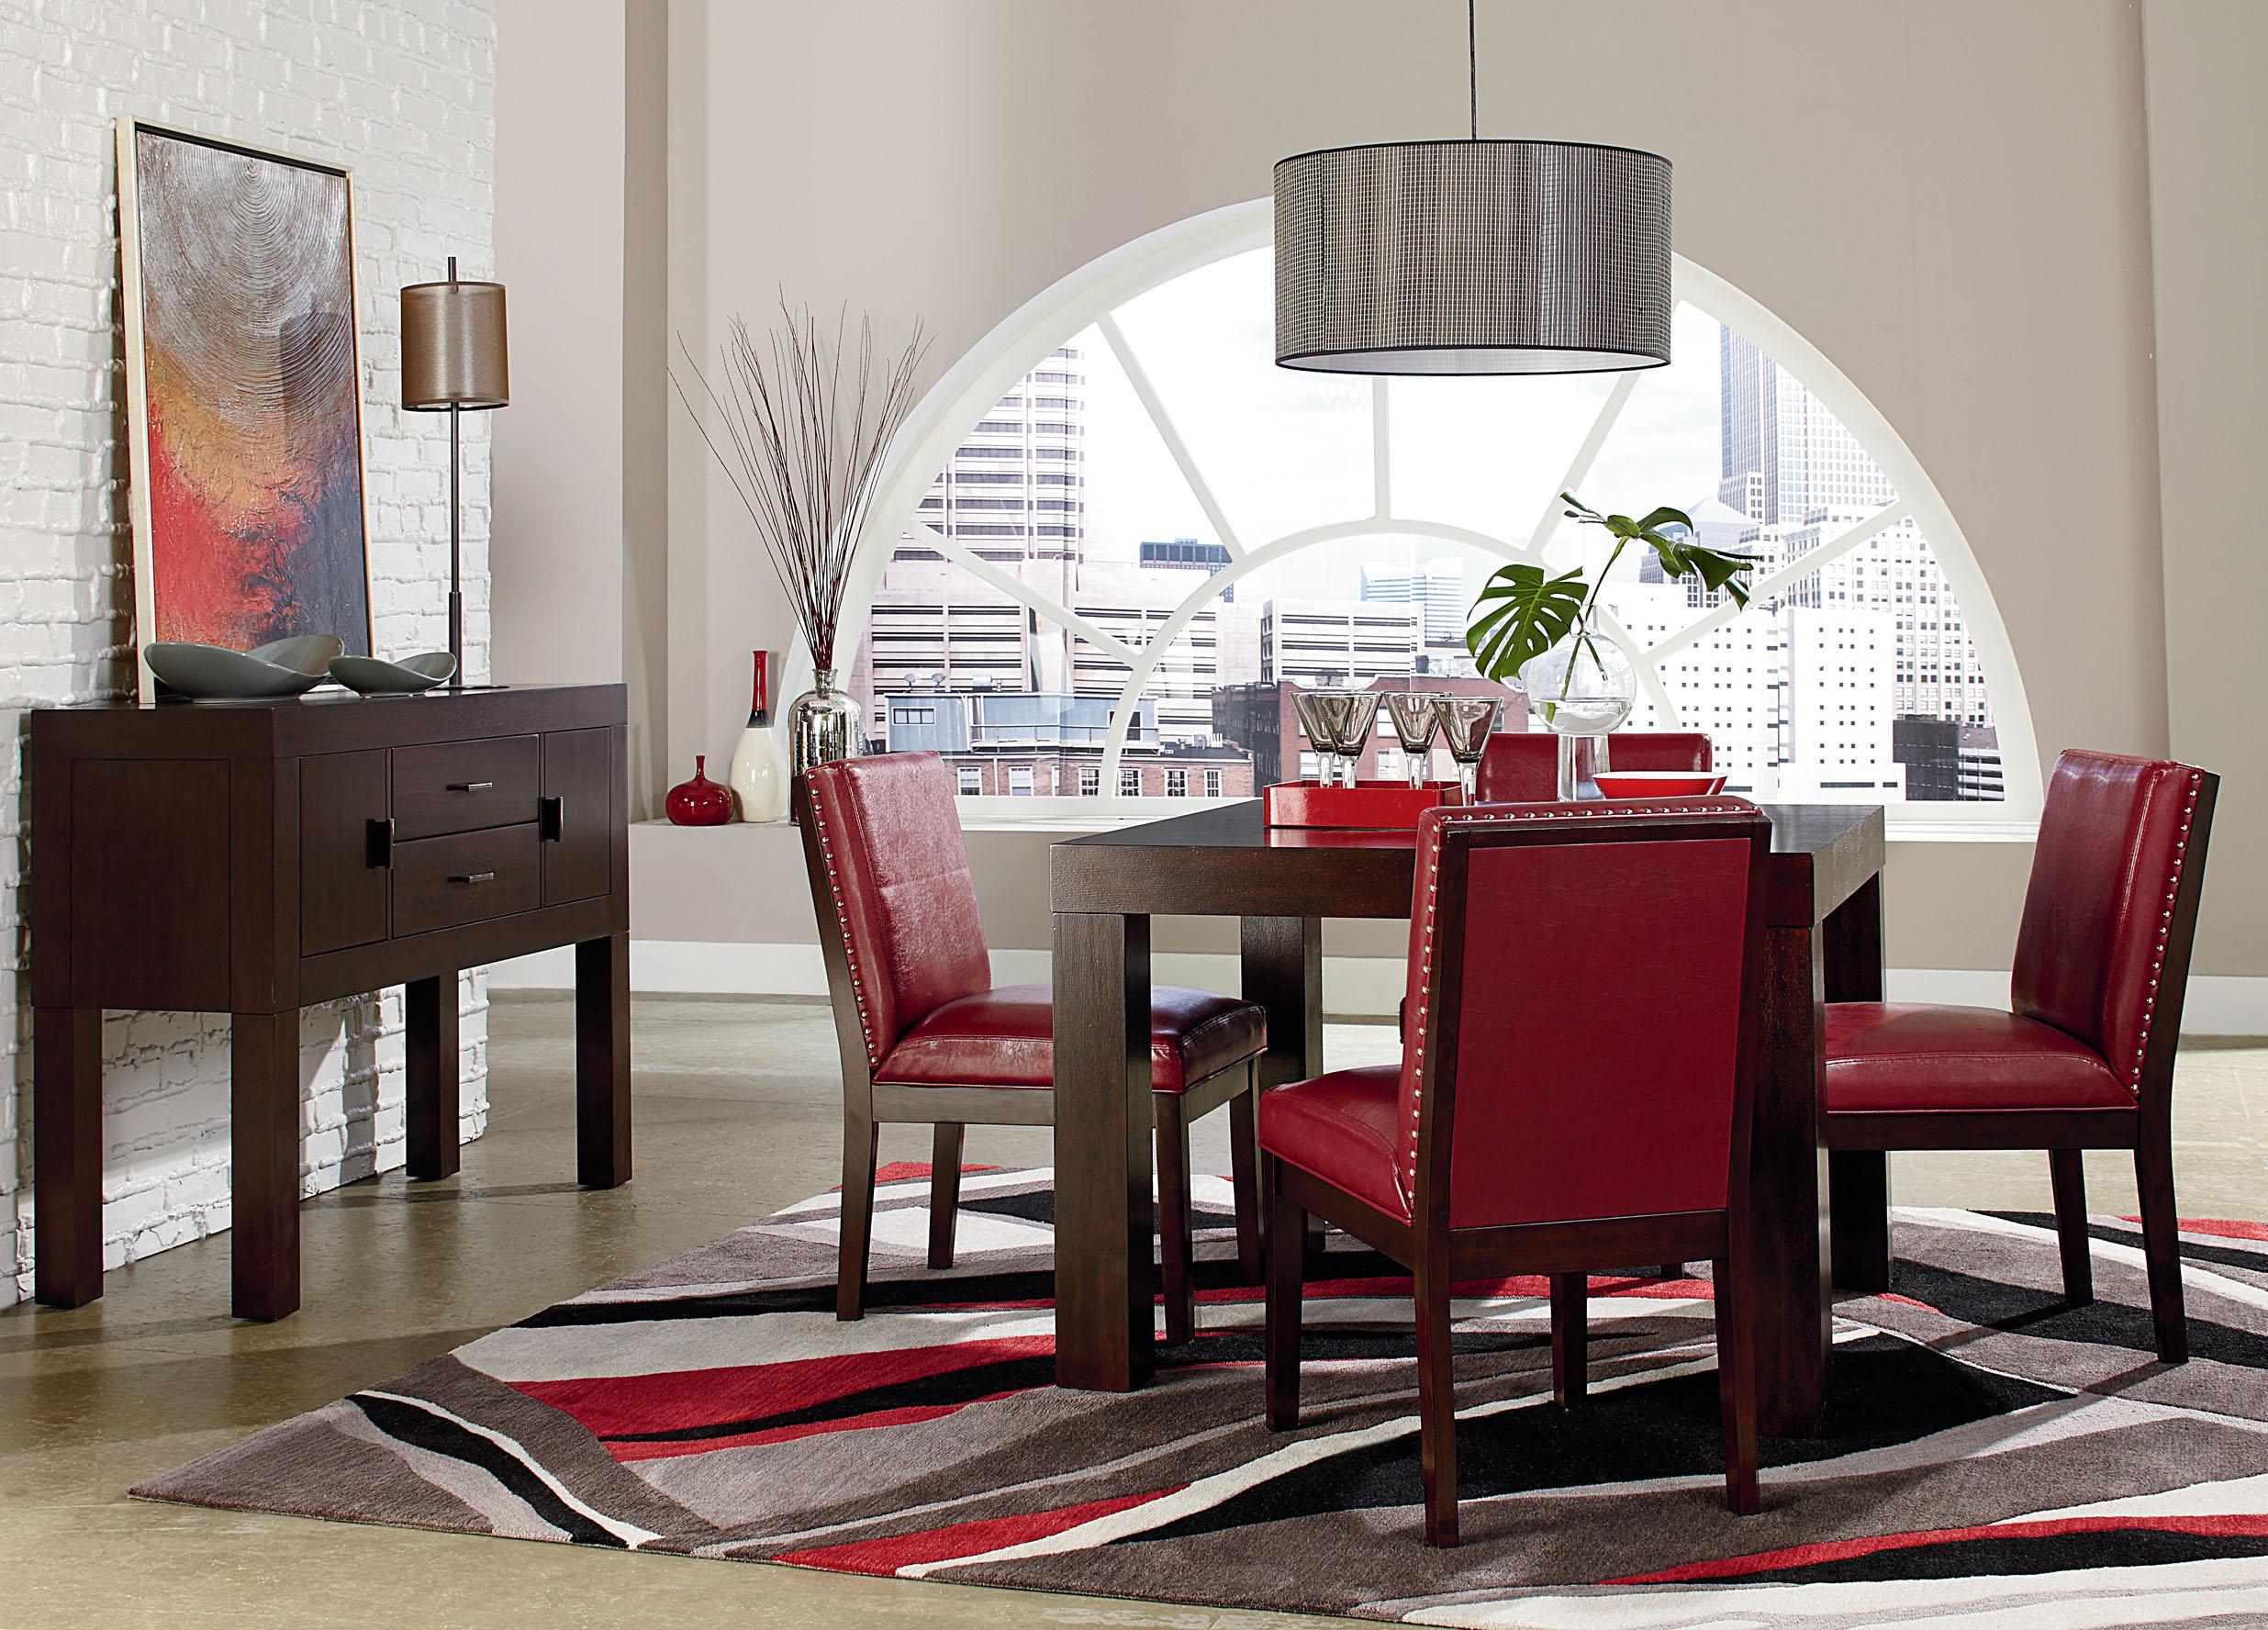 Mattress Brand Reviews >> Standard Furniture Couture Elegance Dining Room 10560 ...